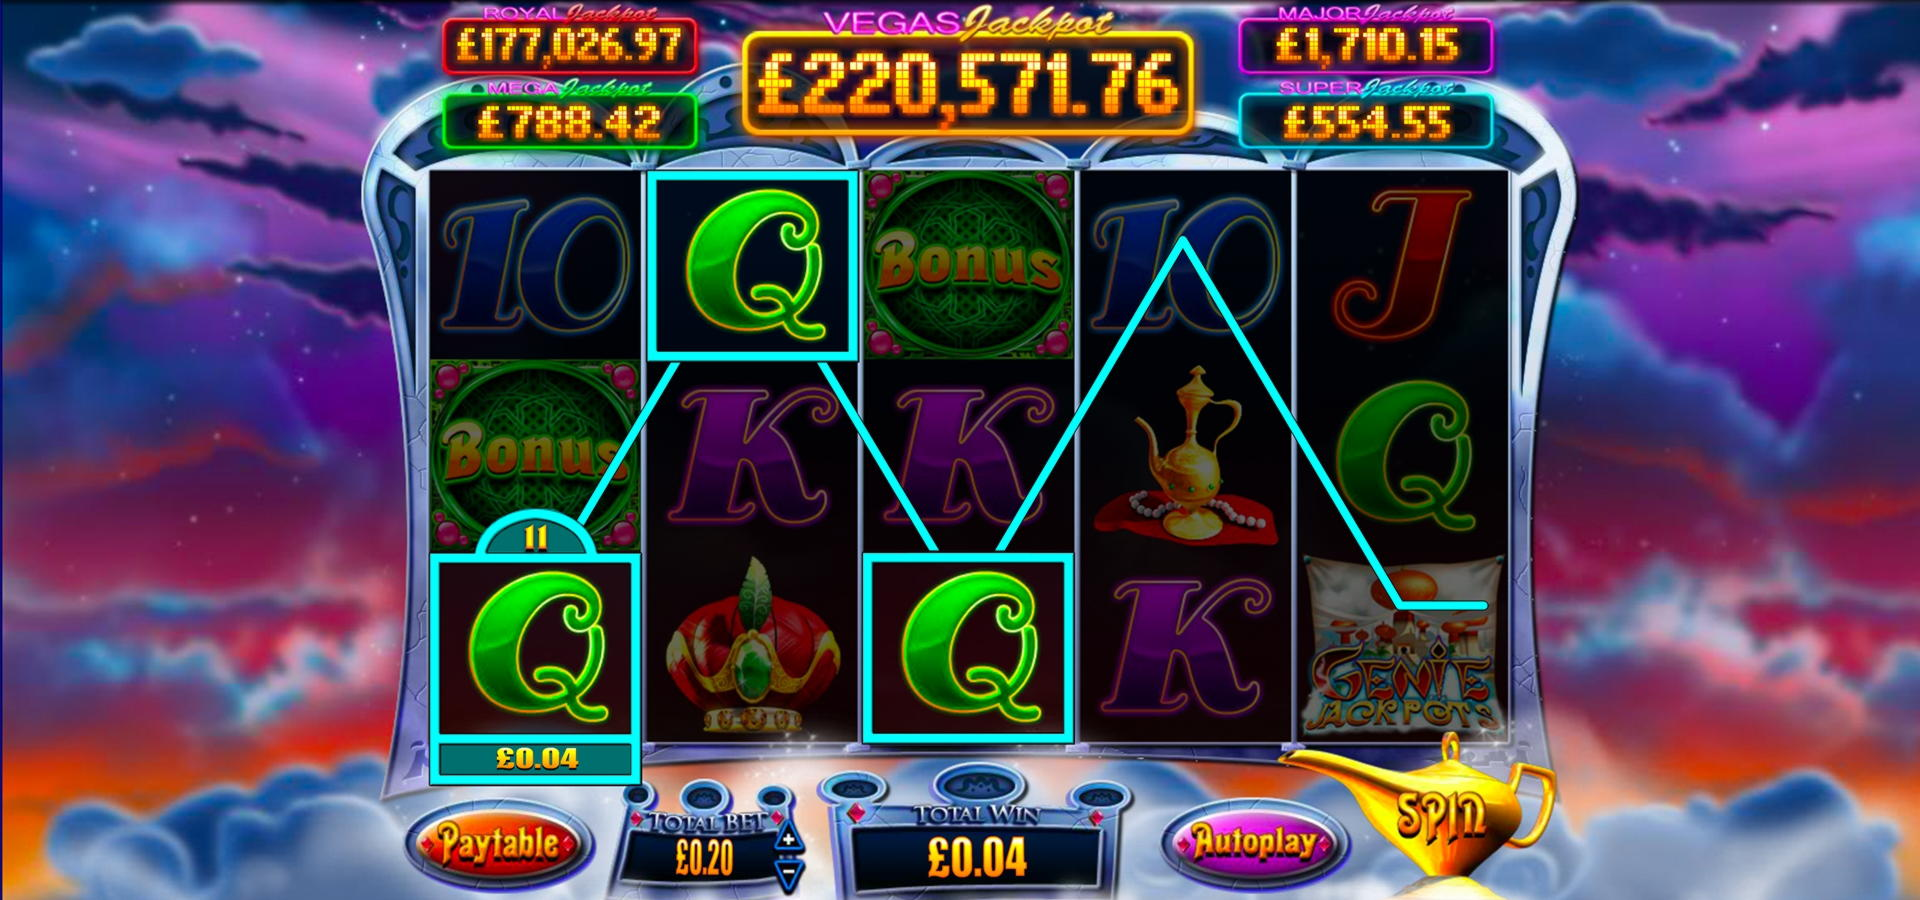 EURO 2910 ДЕПОЗИТТІ КАЗИНО БОНУСЫ Treasure Island Jackpots (Sloto Cash Mirror)